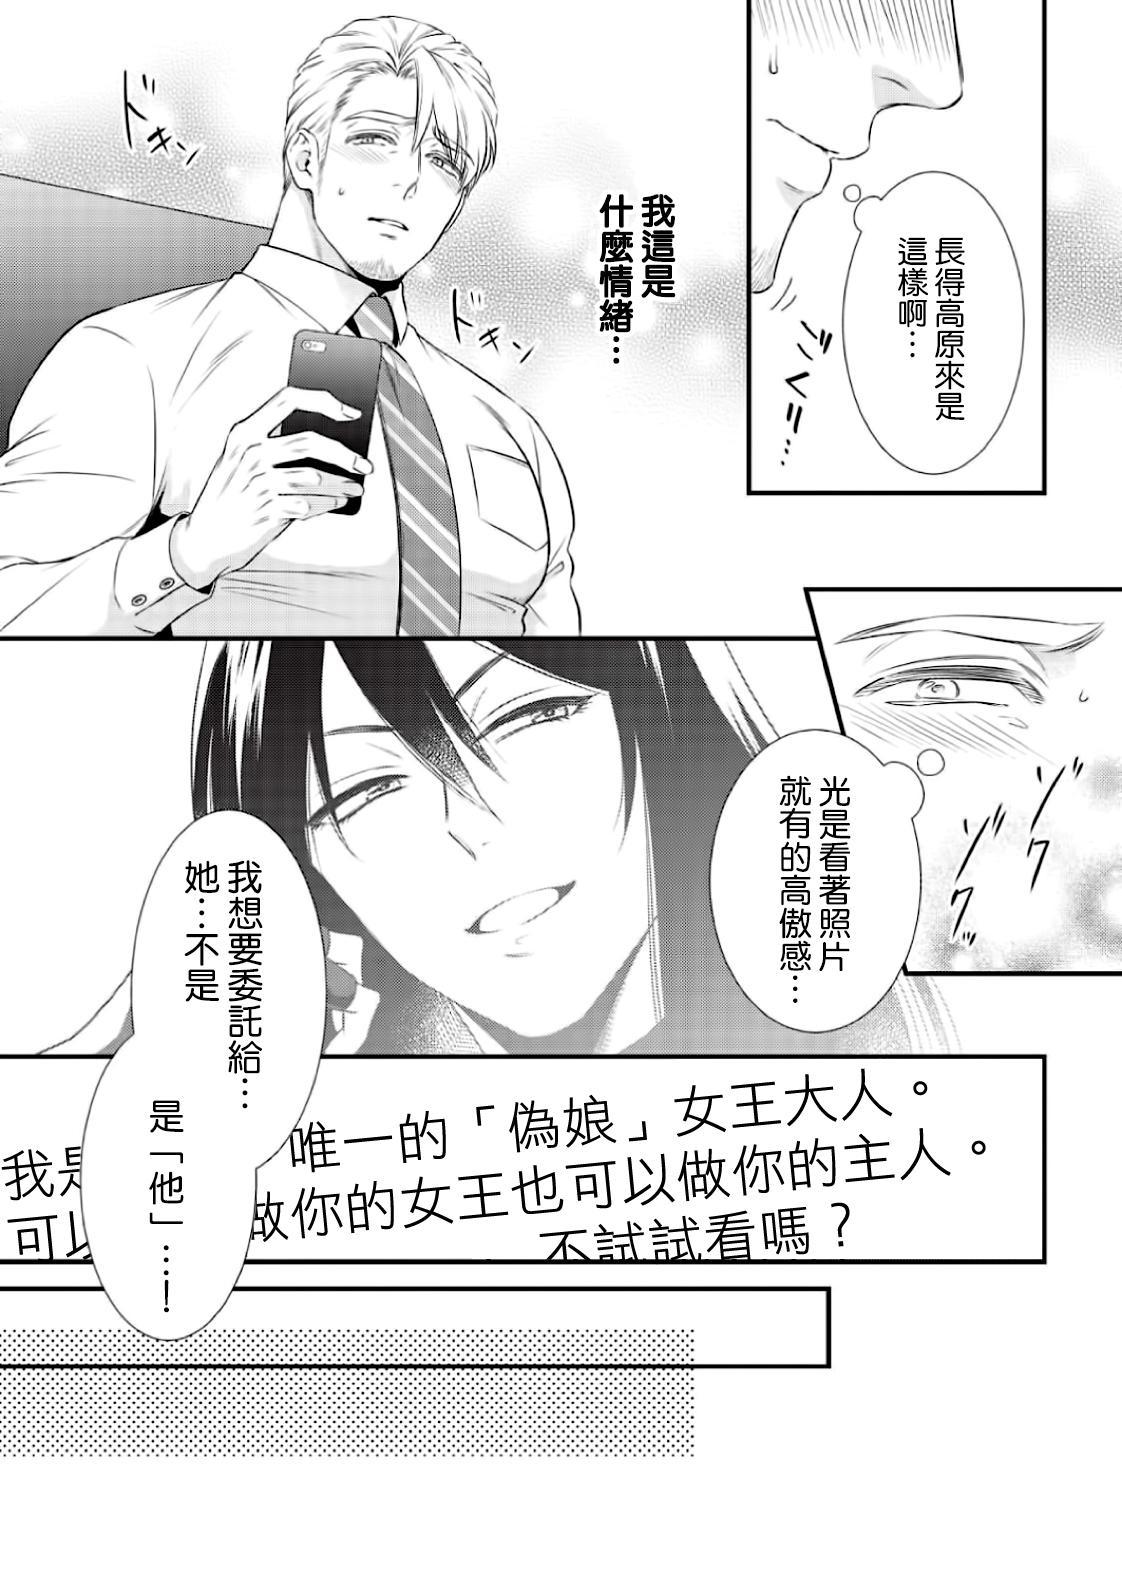 [Aion Kiu] Ijimete Kudasai Omega-sama ch.1-2 [Chinese] [沒有漢化] [Digital] 9